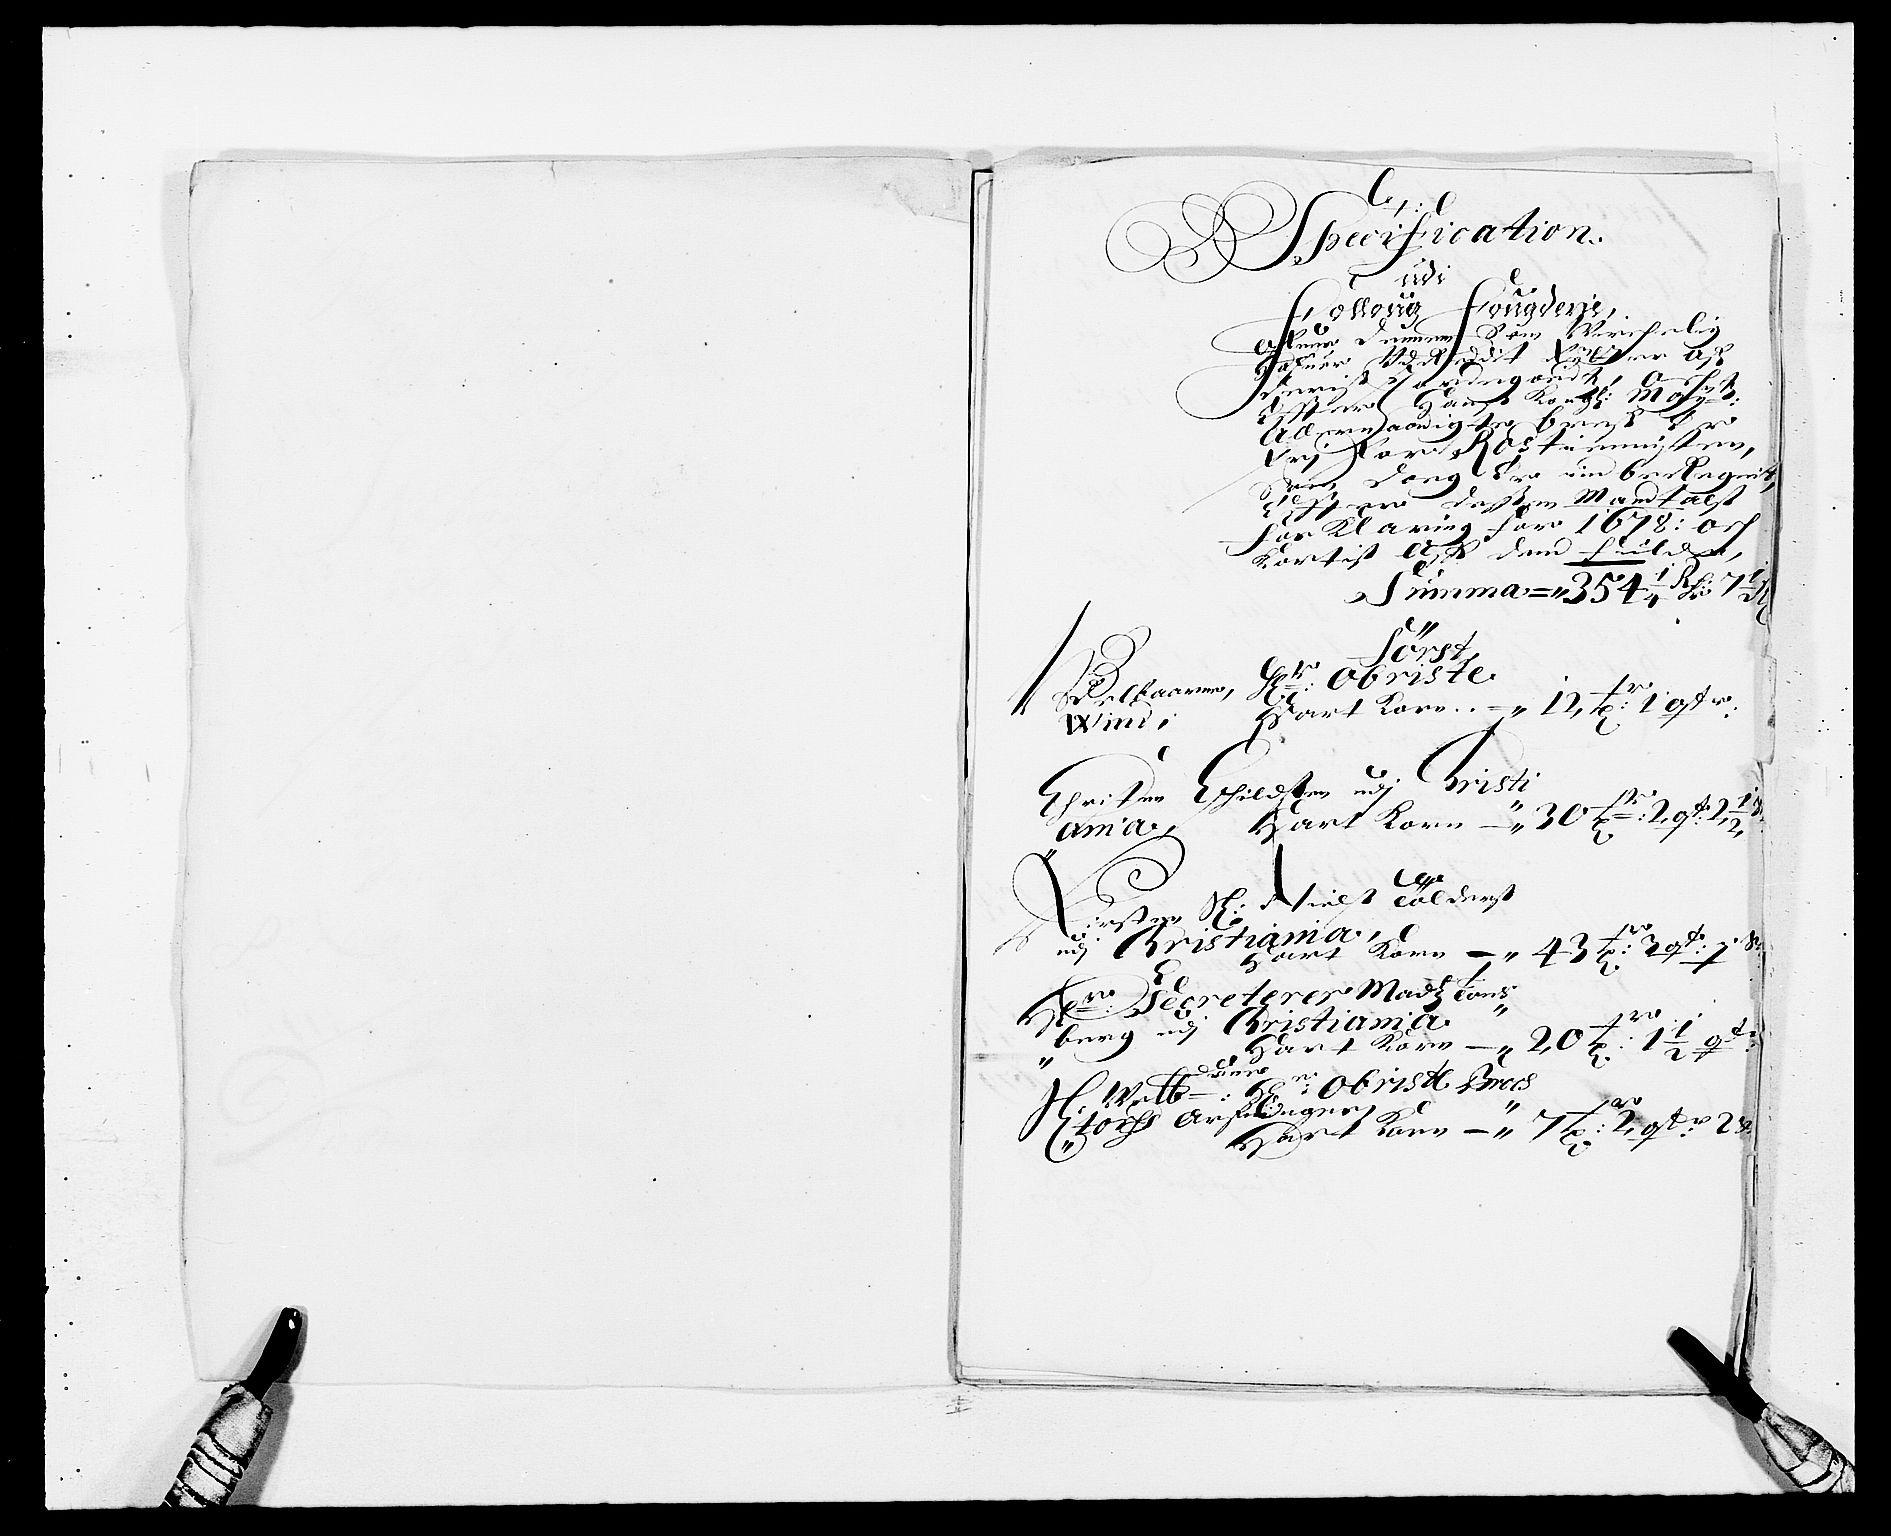 RA, Rentekammeret inntil 1814, Reviderte regnskaper, Fogderegnskap, R09/L0427: Fogderegnskap Follo, 1678, s. 249